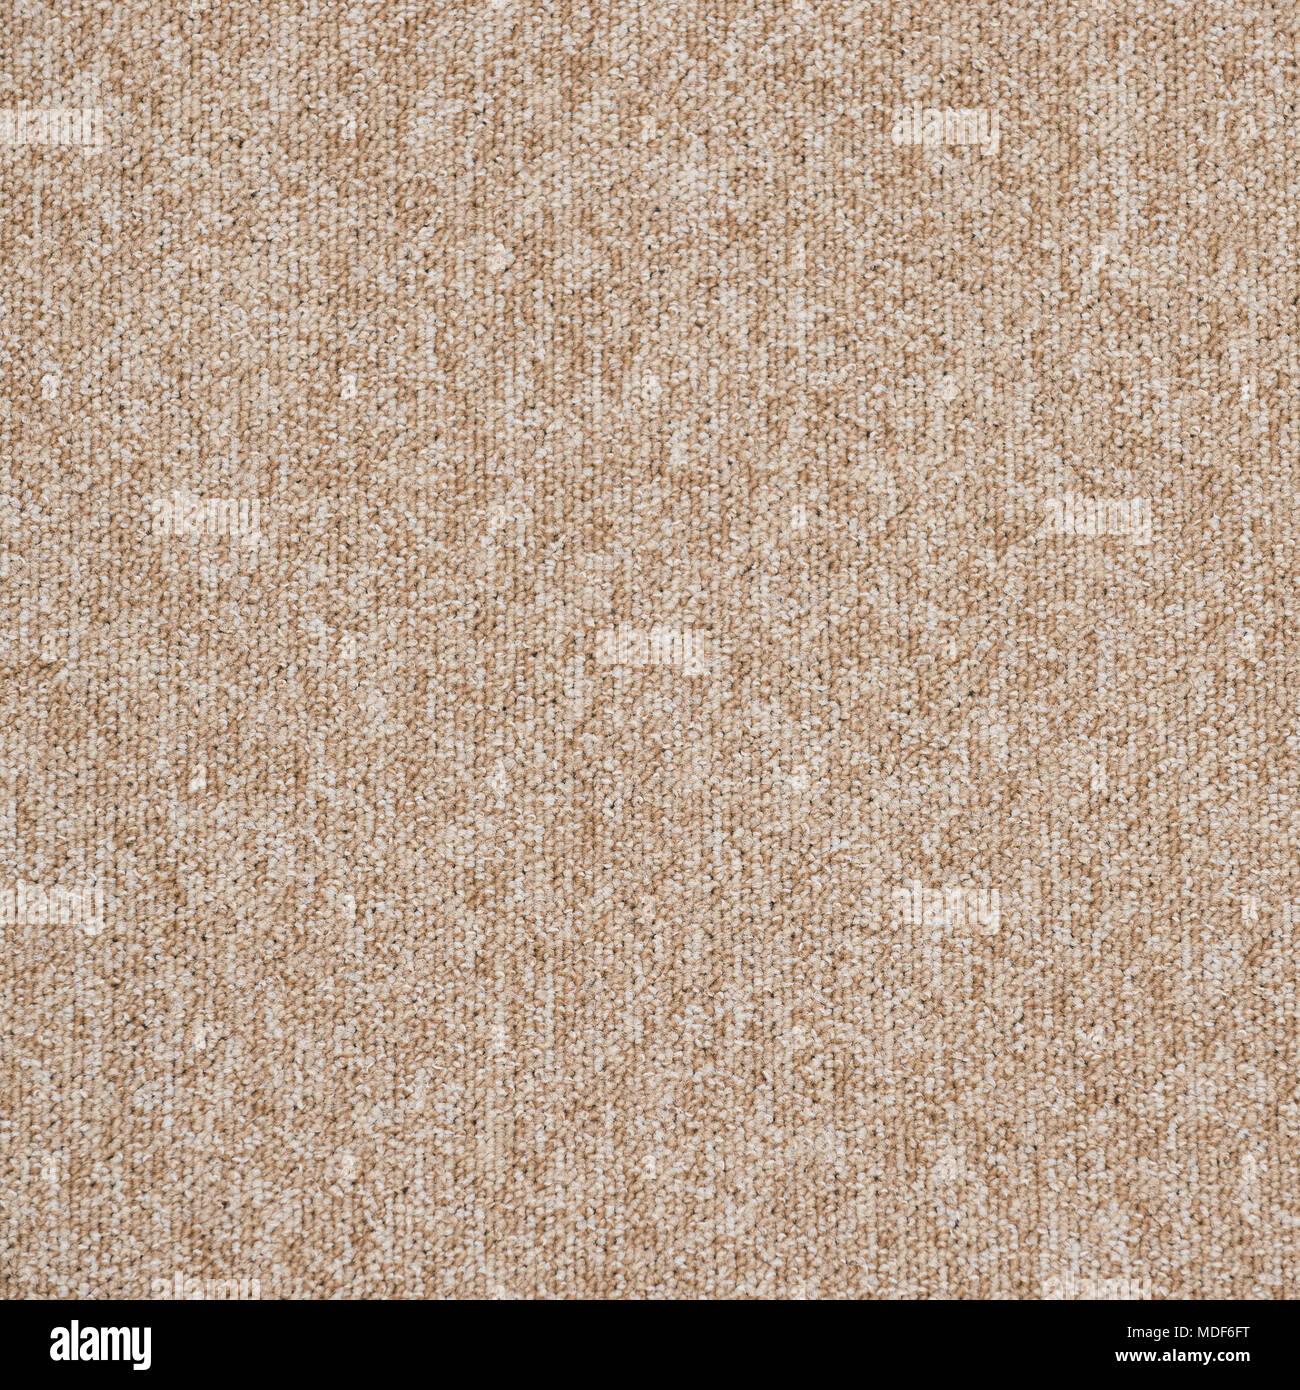 coloured carpet tiles textures stock